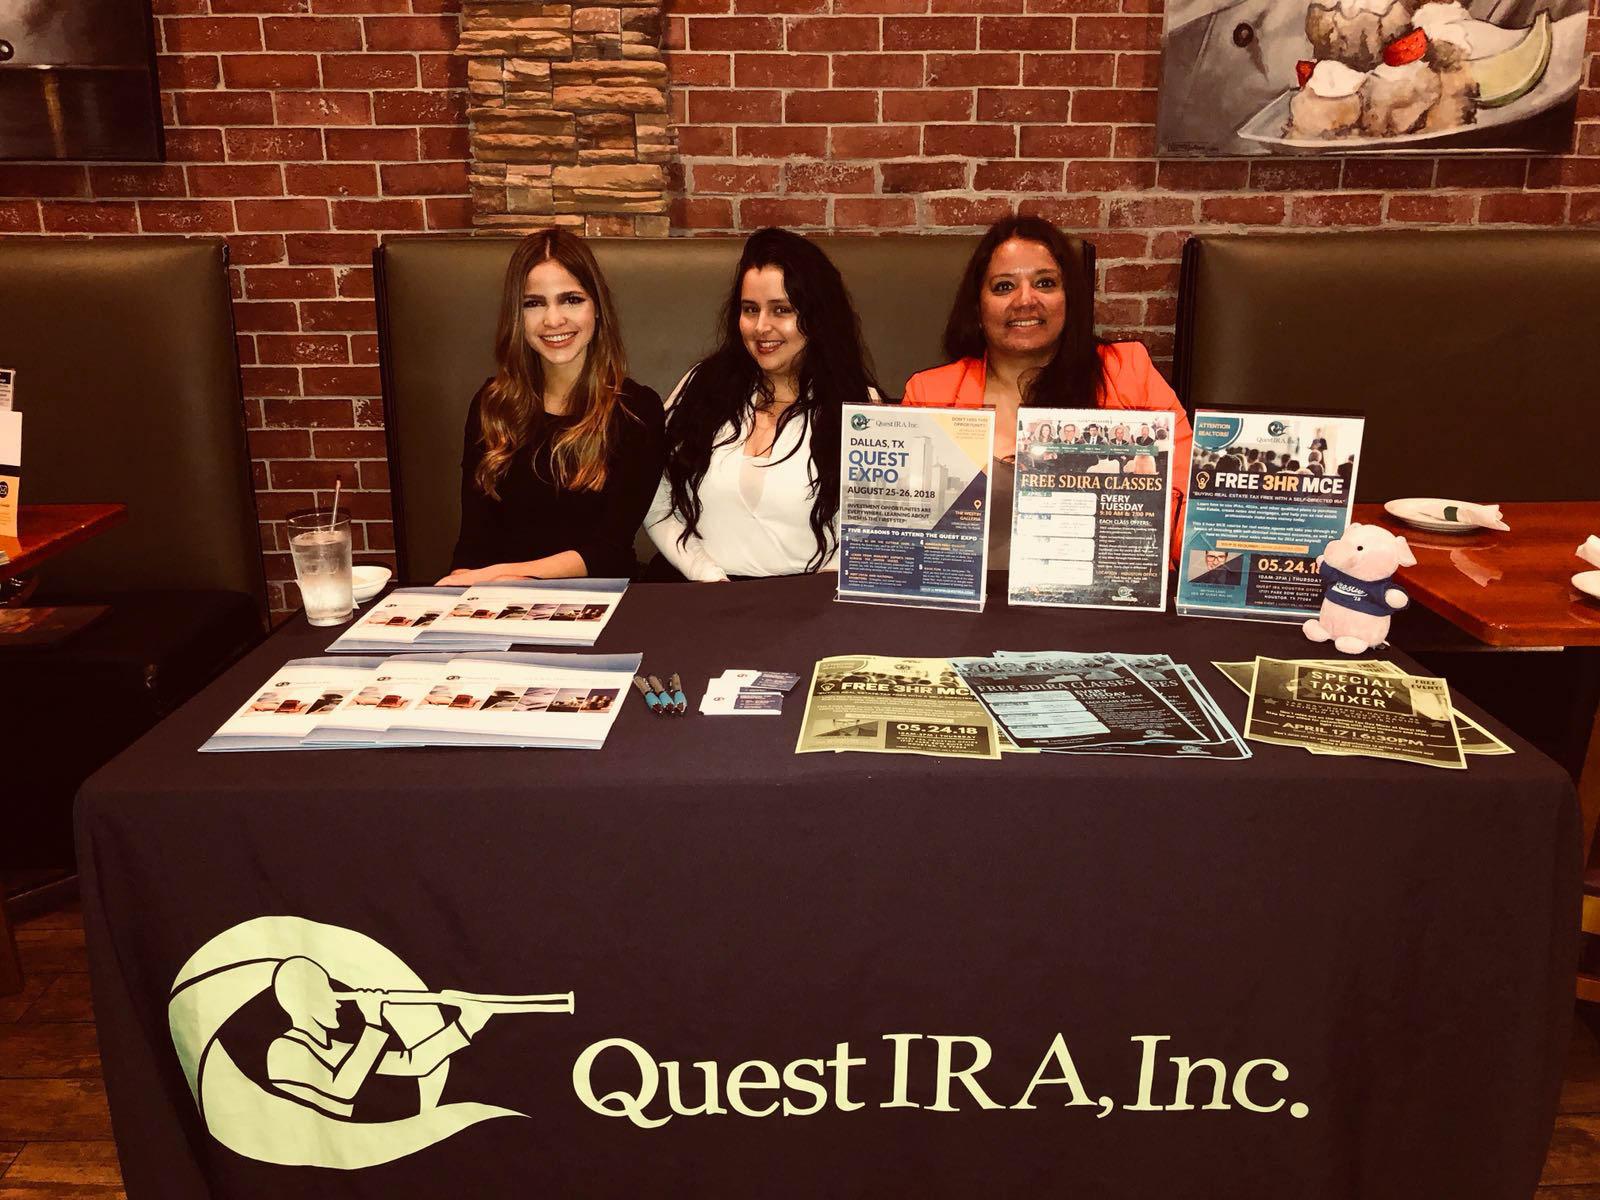 Quest IRA / Sponsor